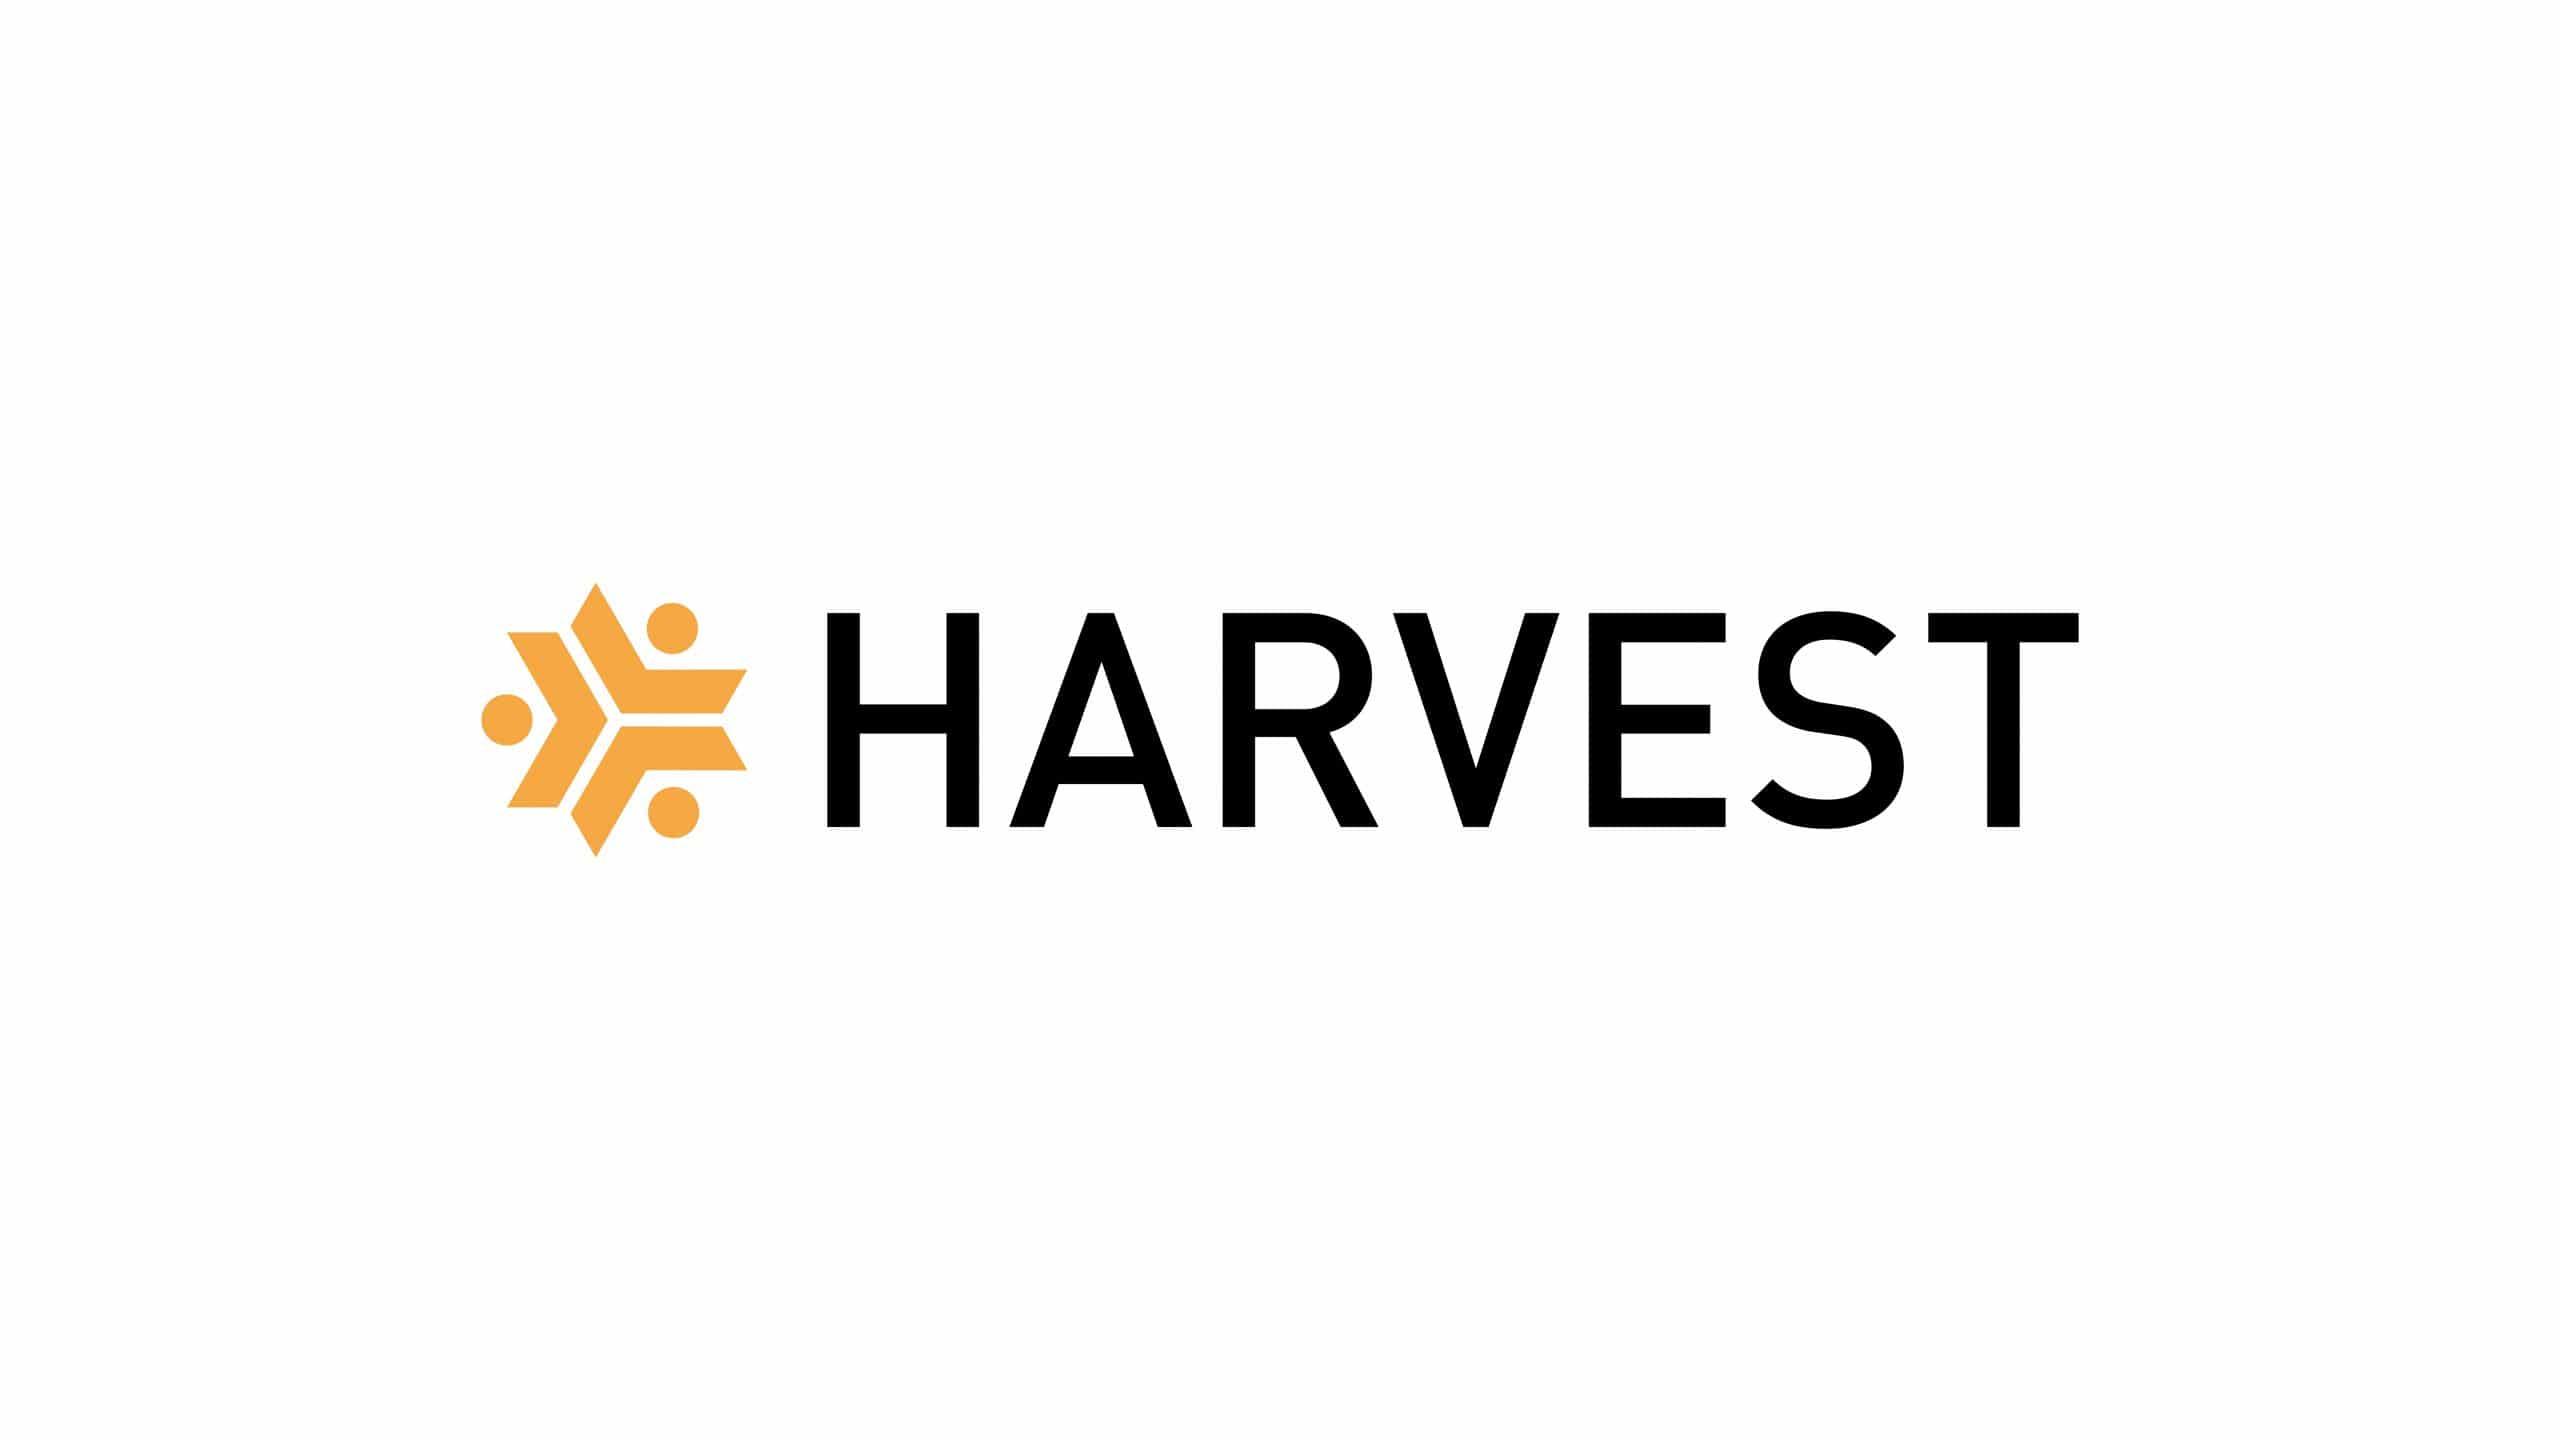 fitosophy-mit100k-harvest1